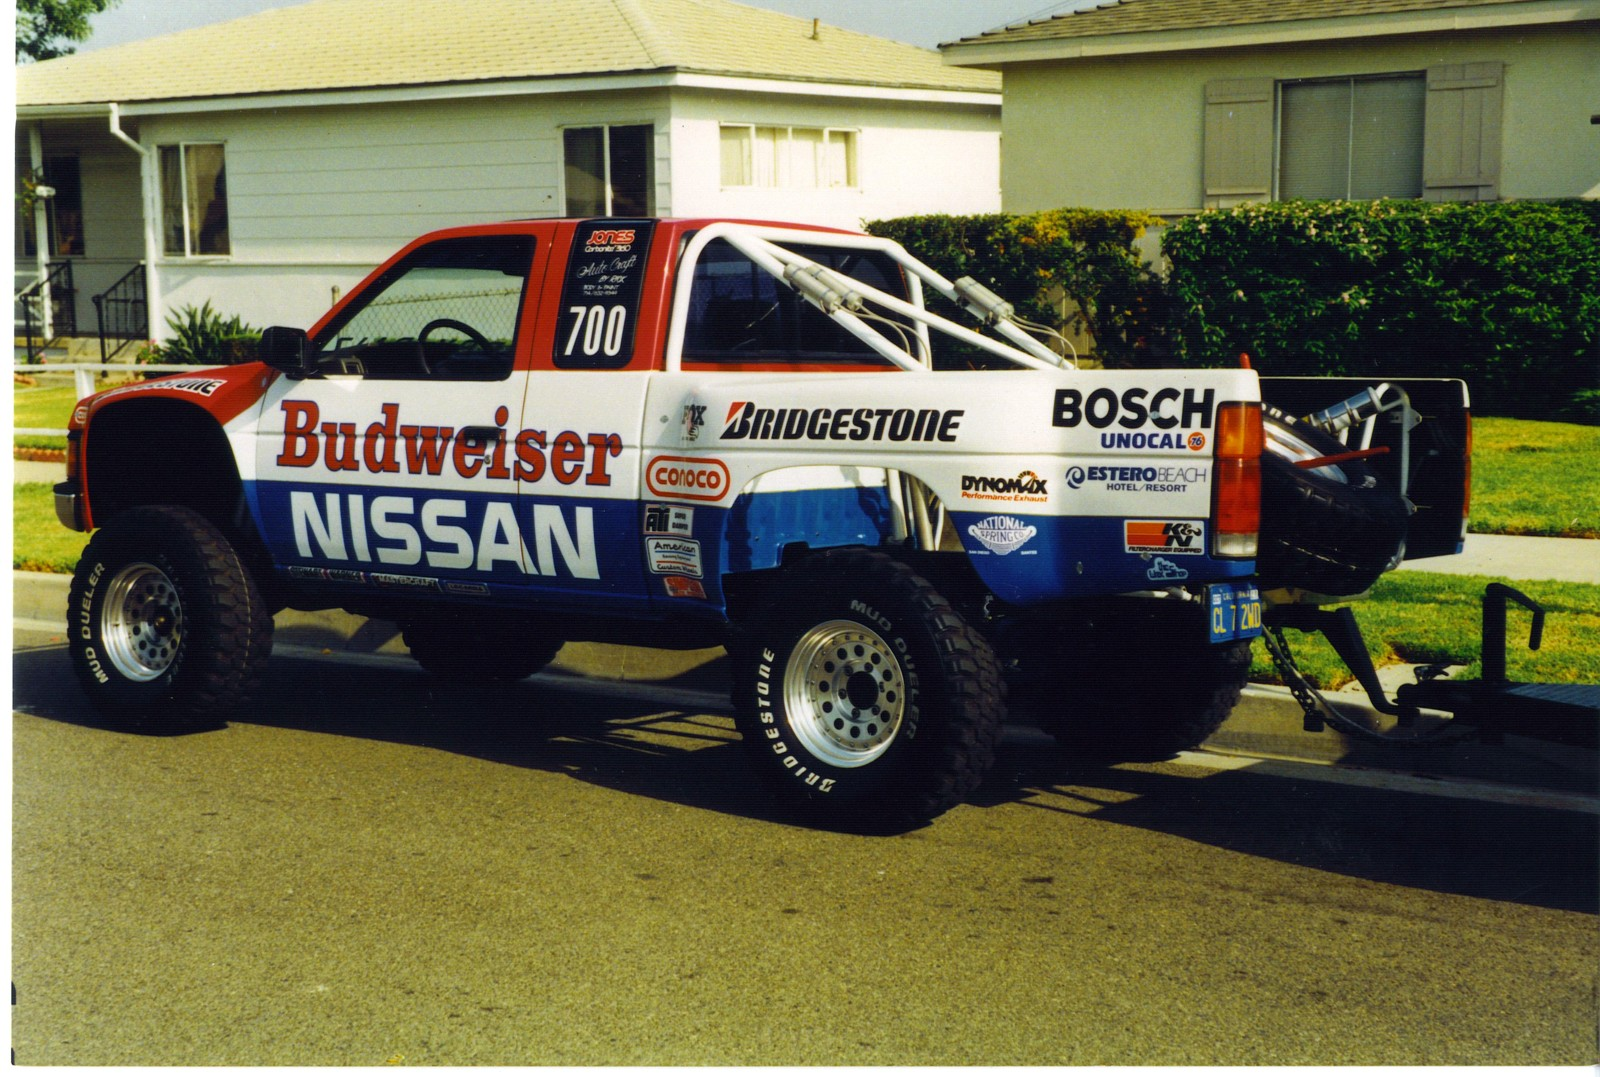 Nissan D21 24 Crew Cab 4x4 Photos Reviews News Specs Buy Car